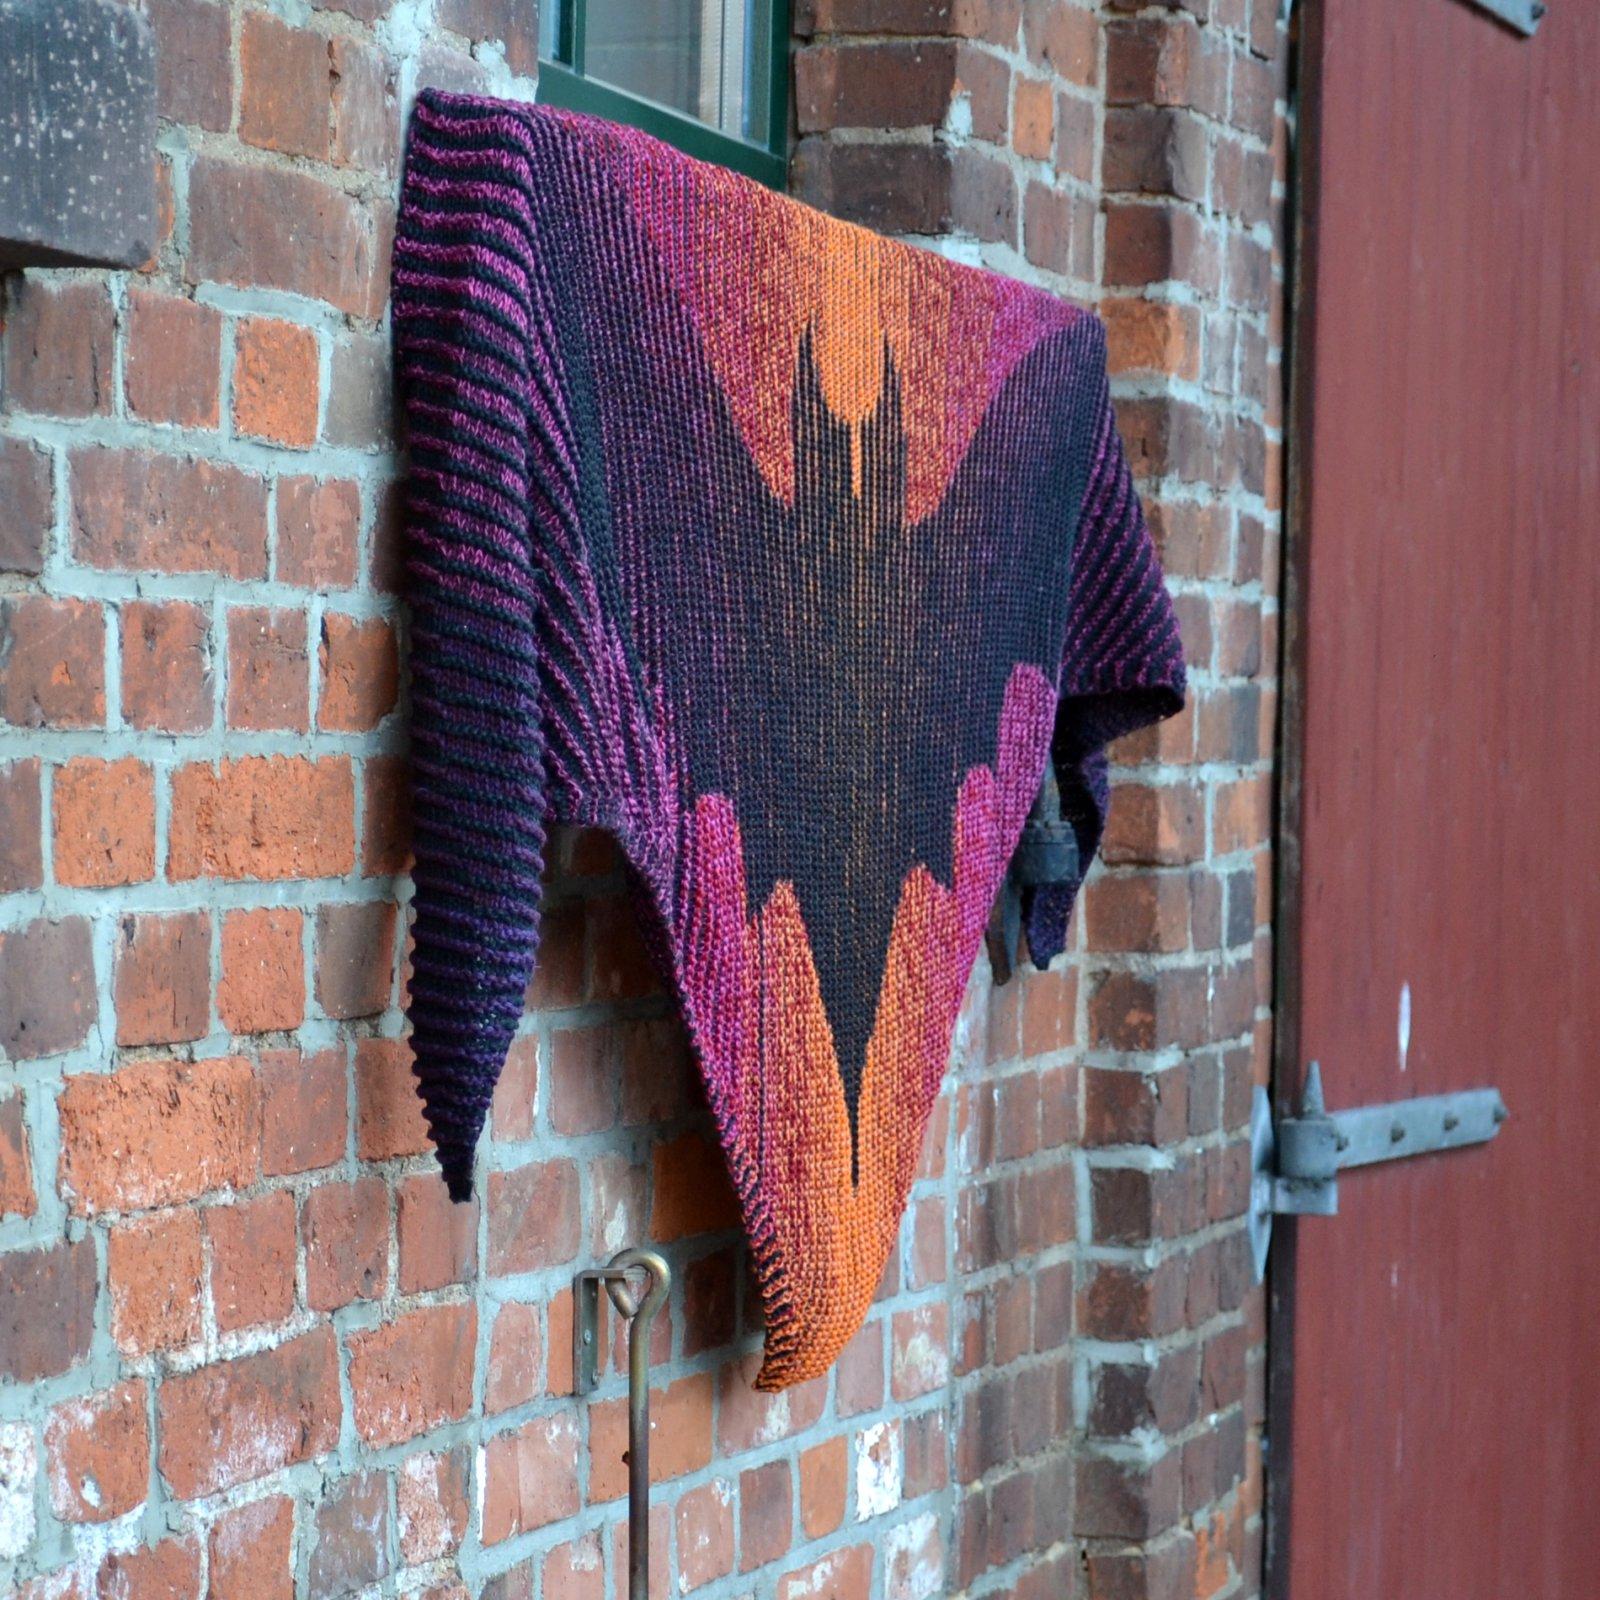 Bat Shadow Knitting Kit